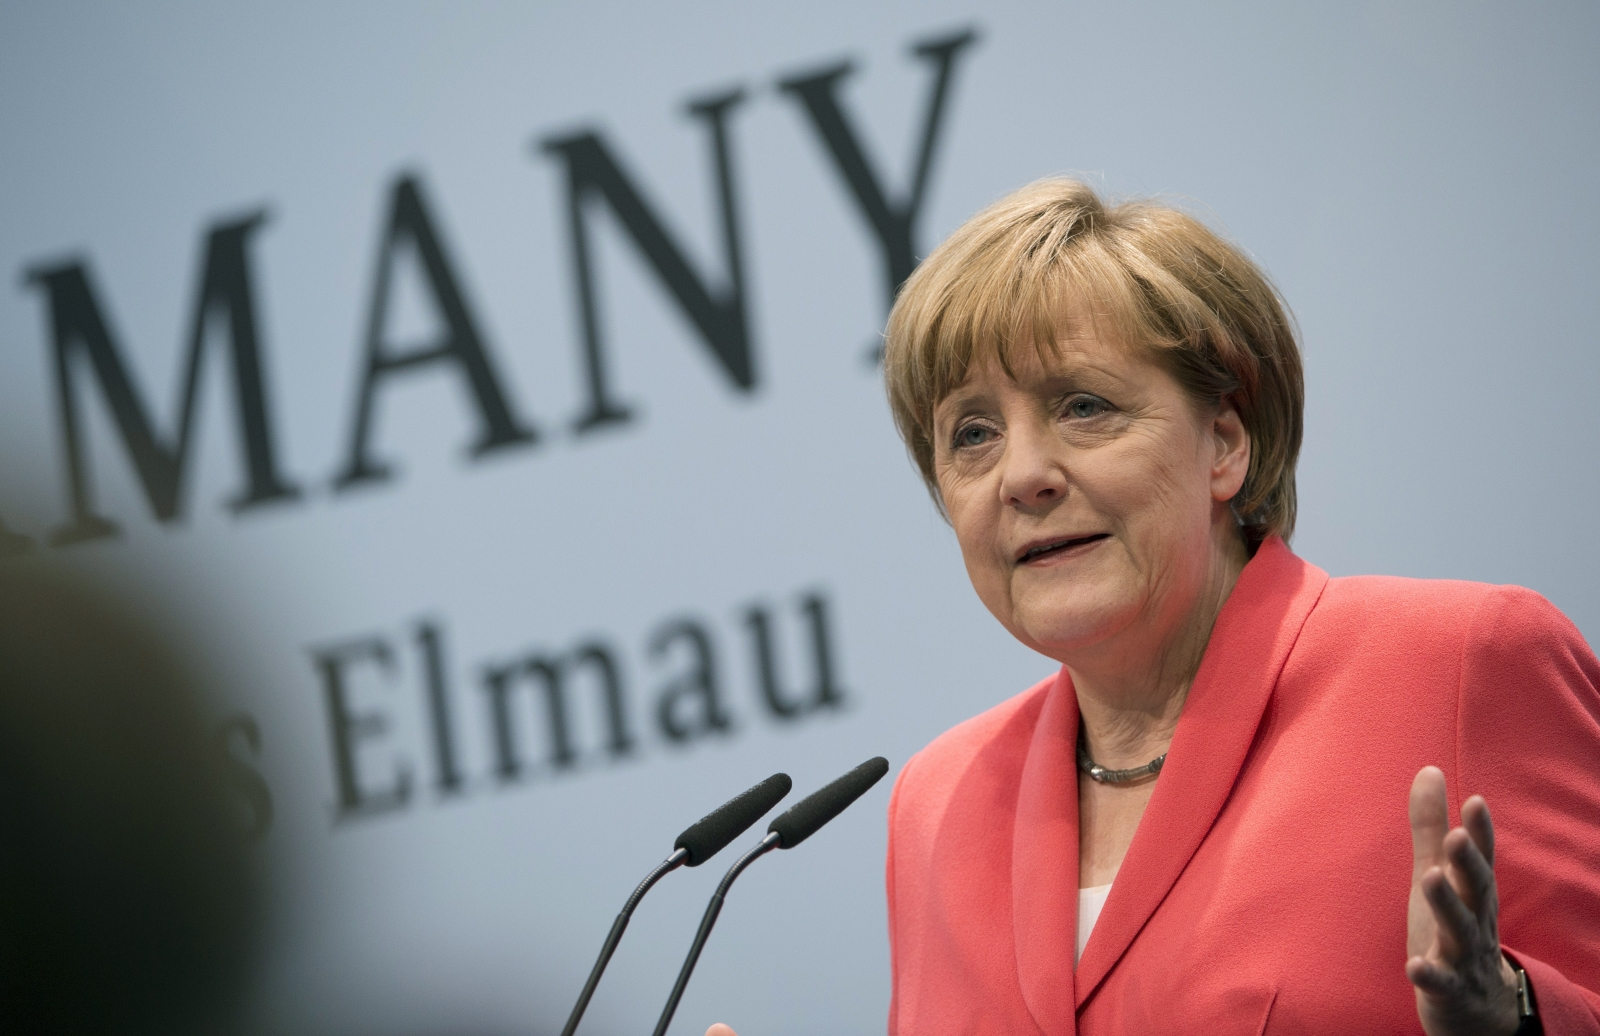 Angela Merkel at the G7